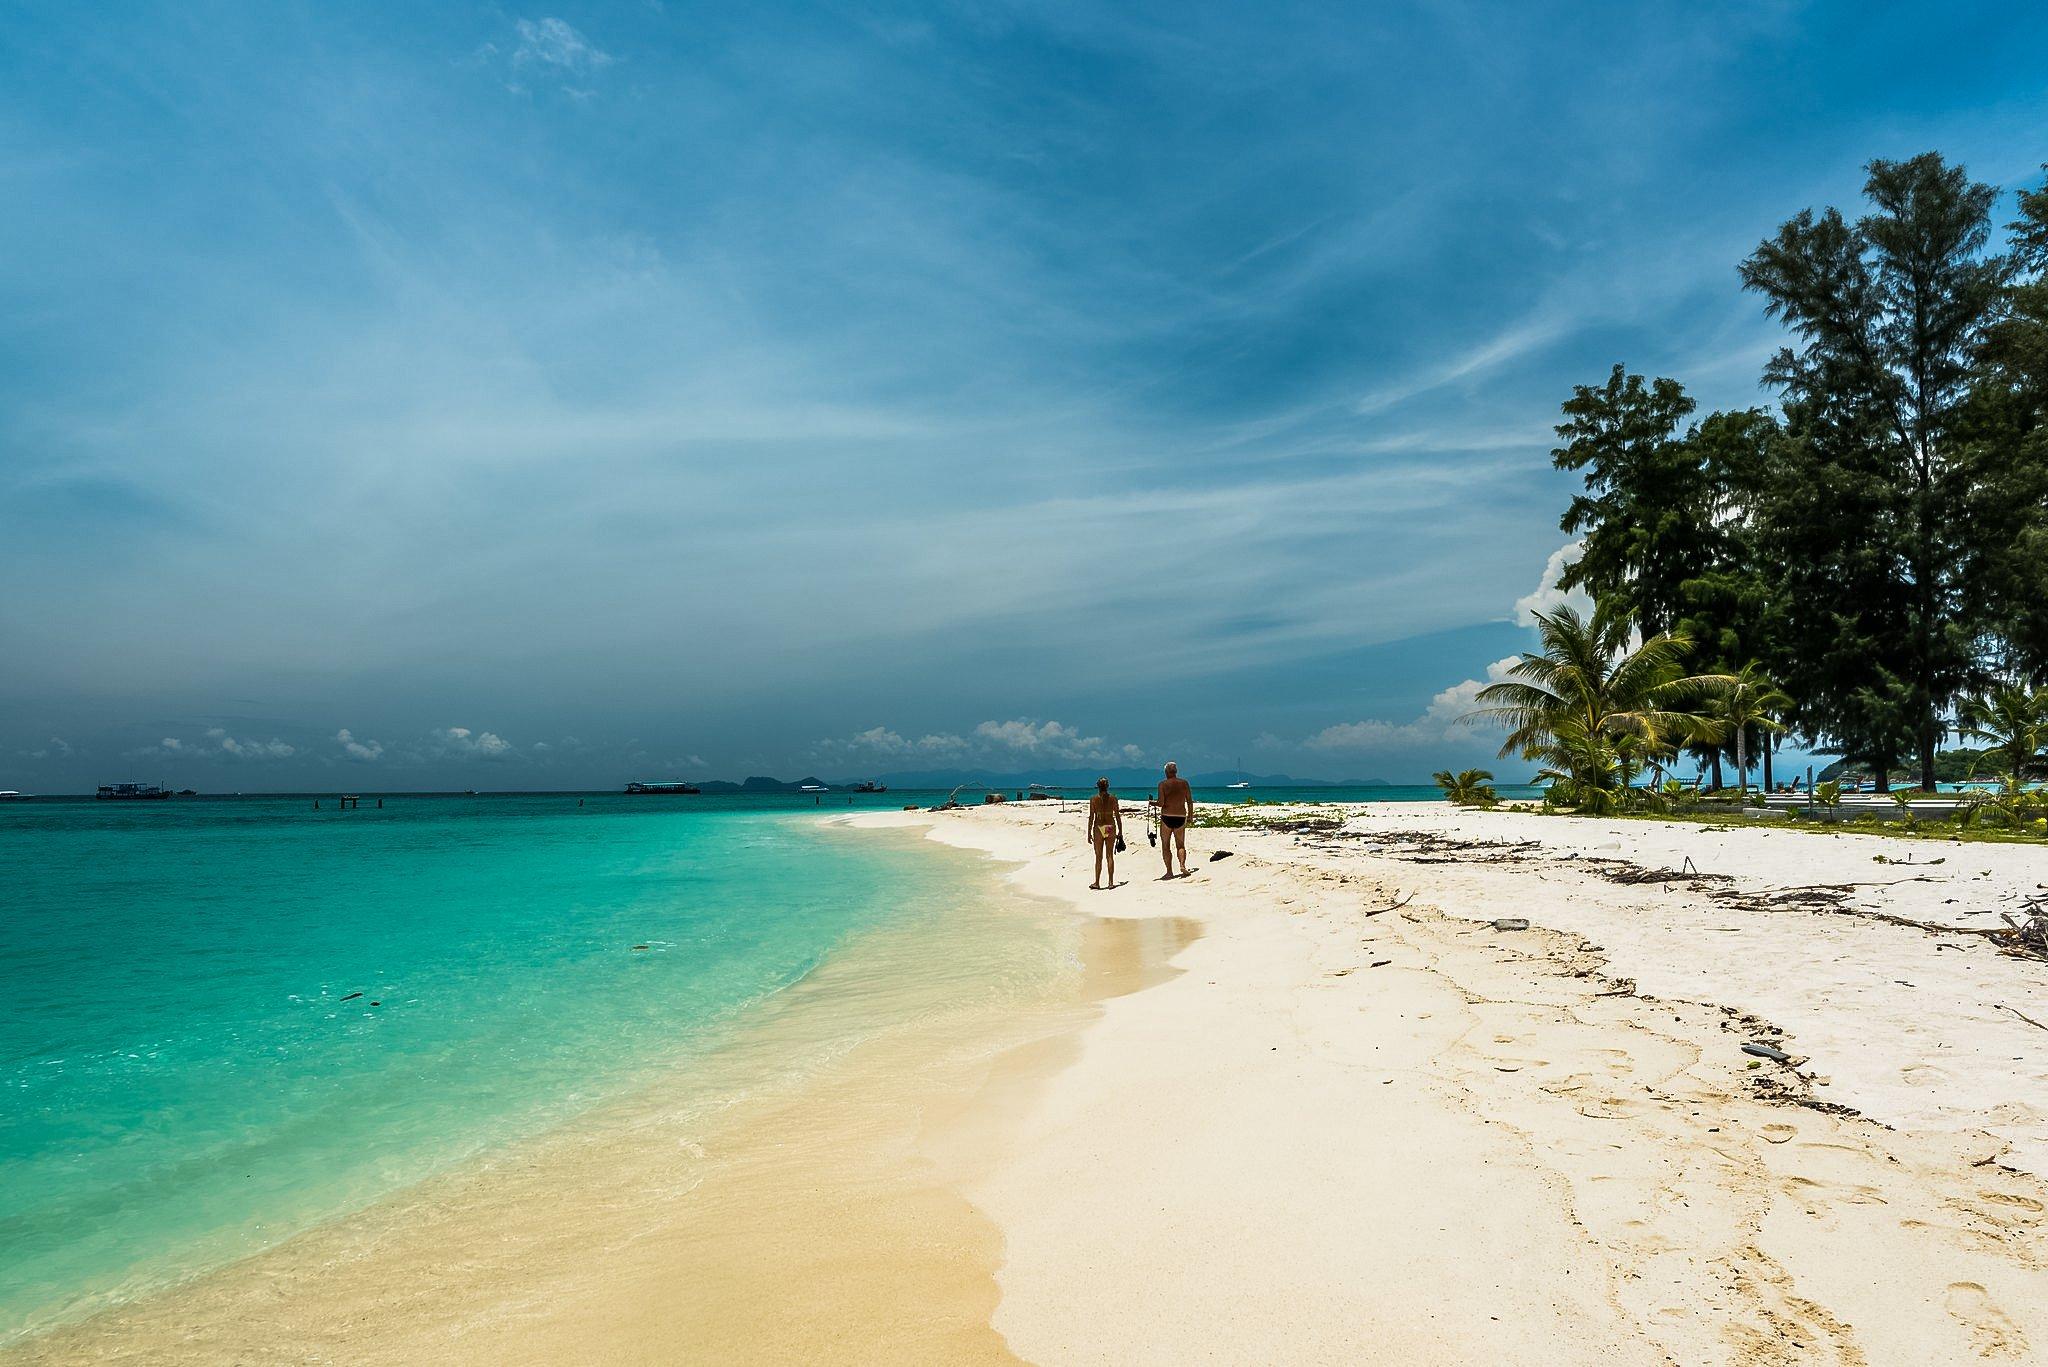 L-shaped Koh Lipe island in thailand.